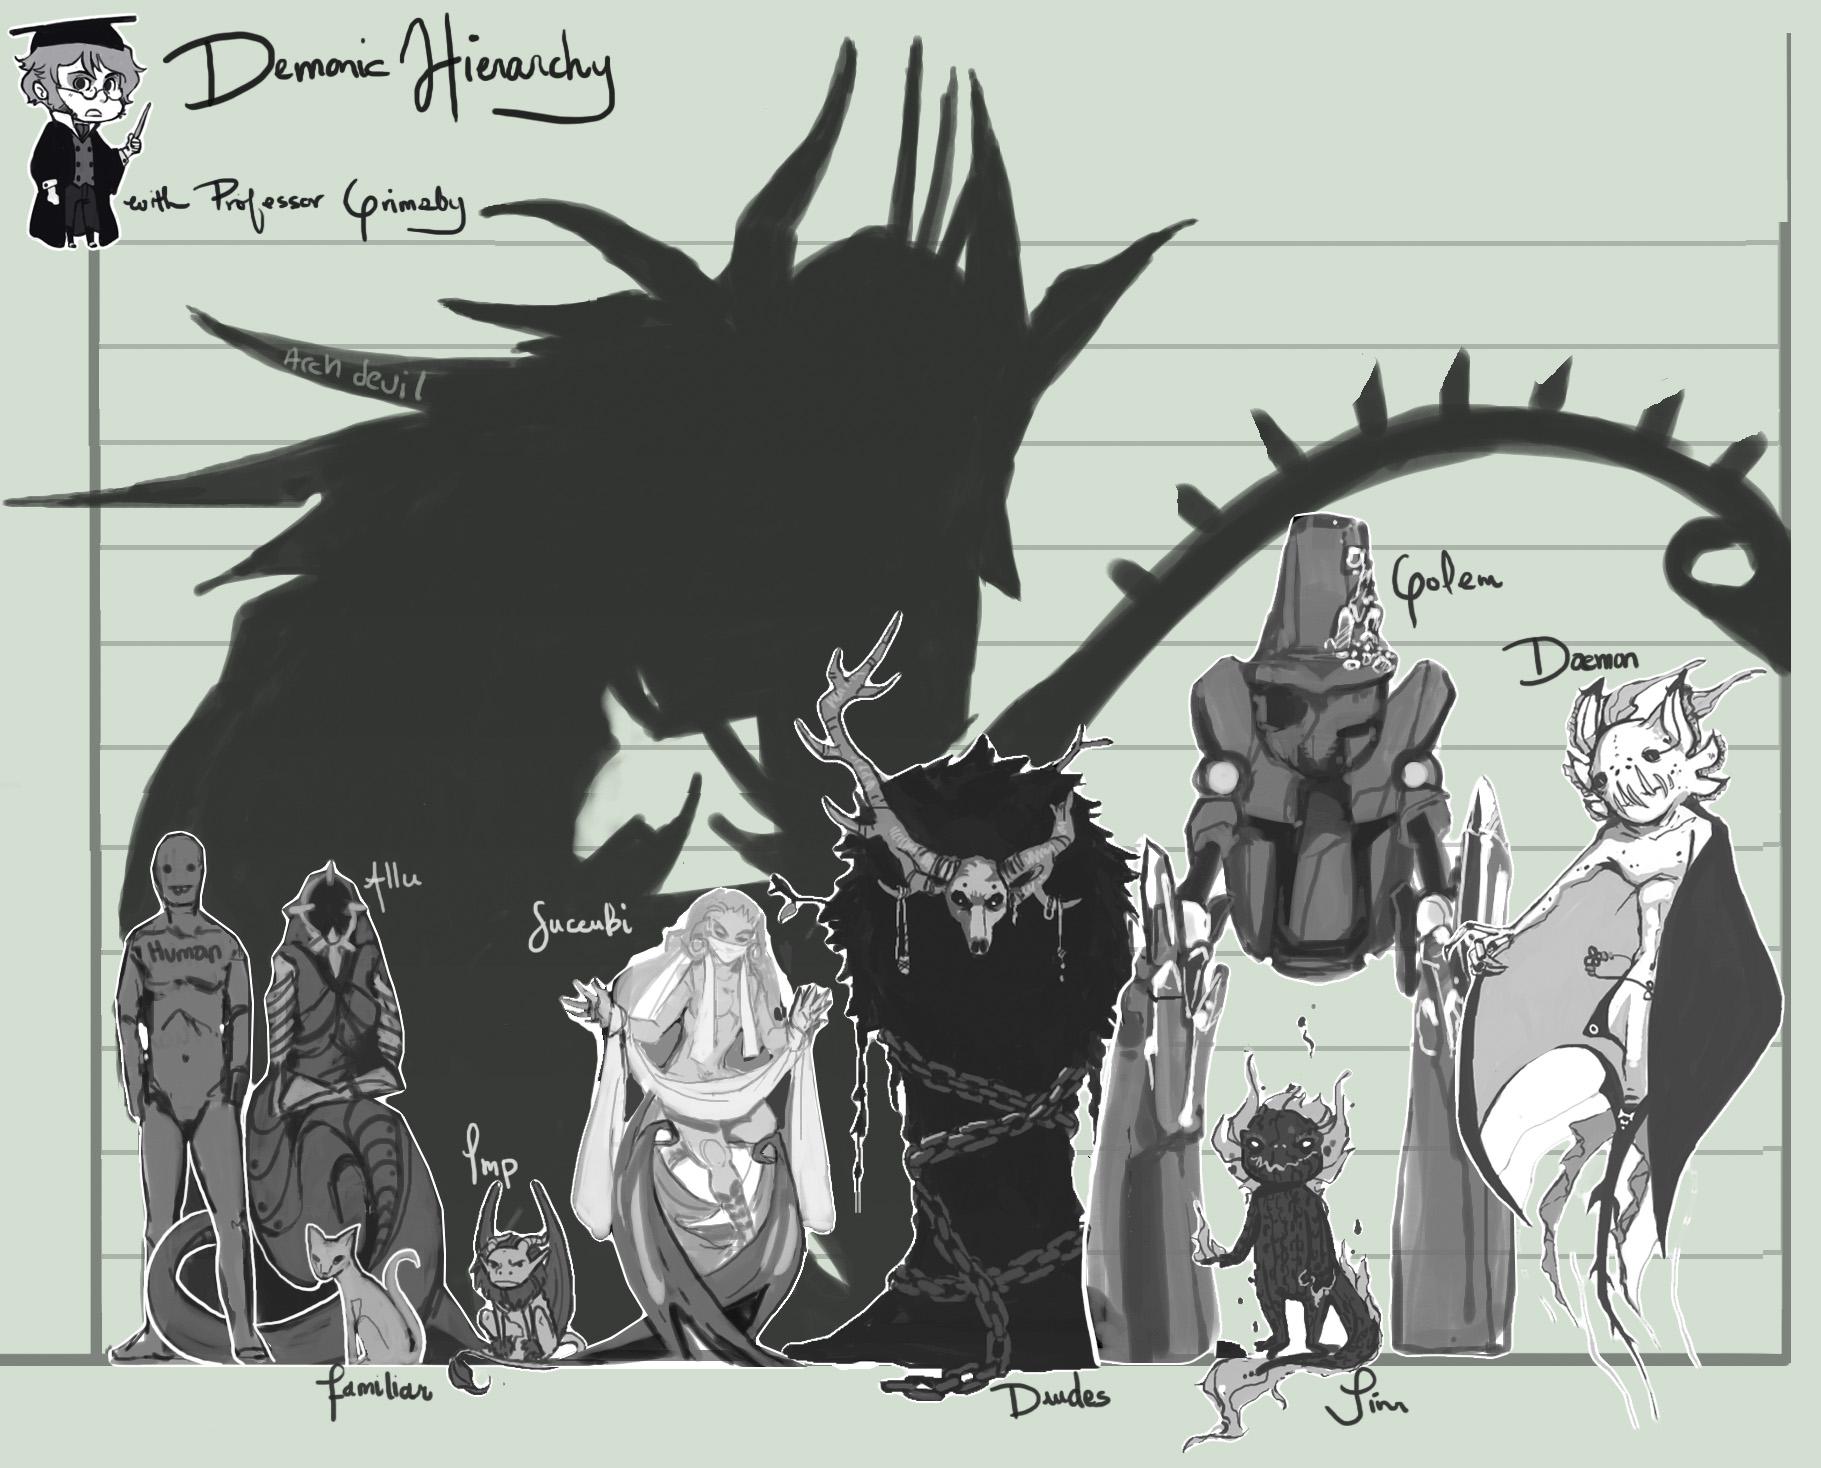 Demonology 101 by ianuae